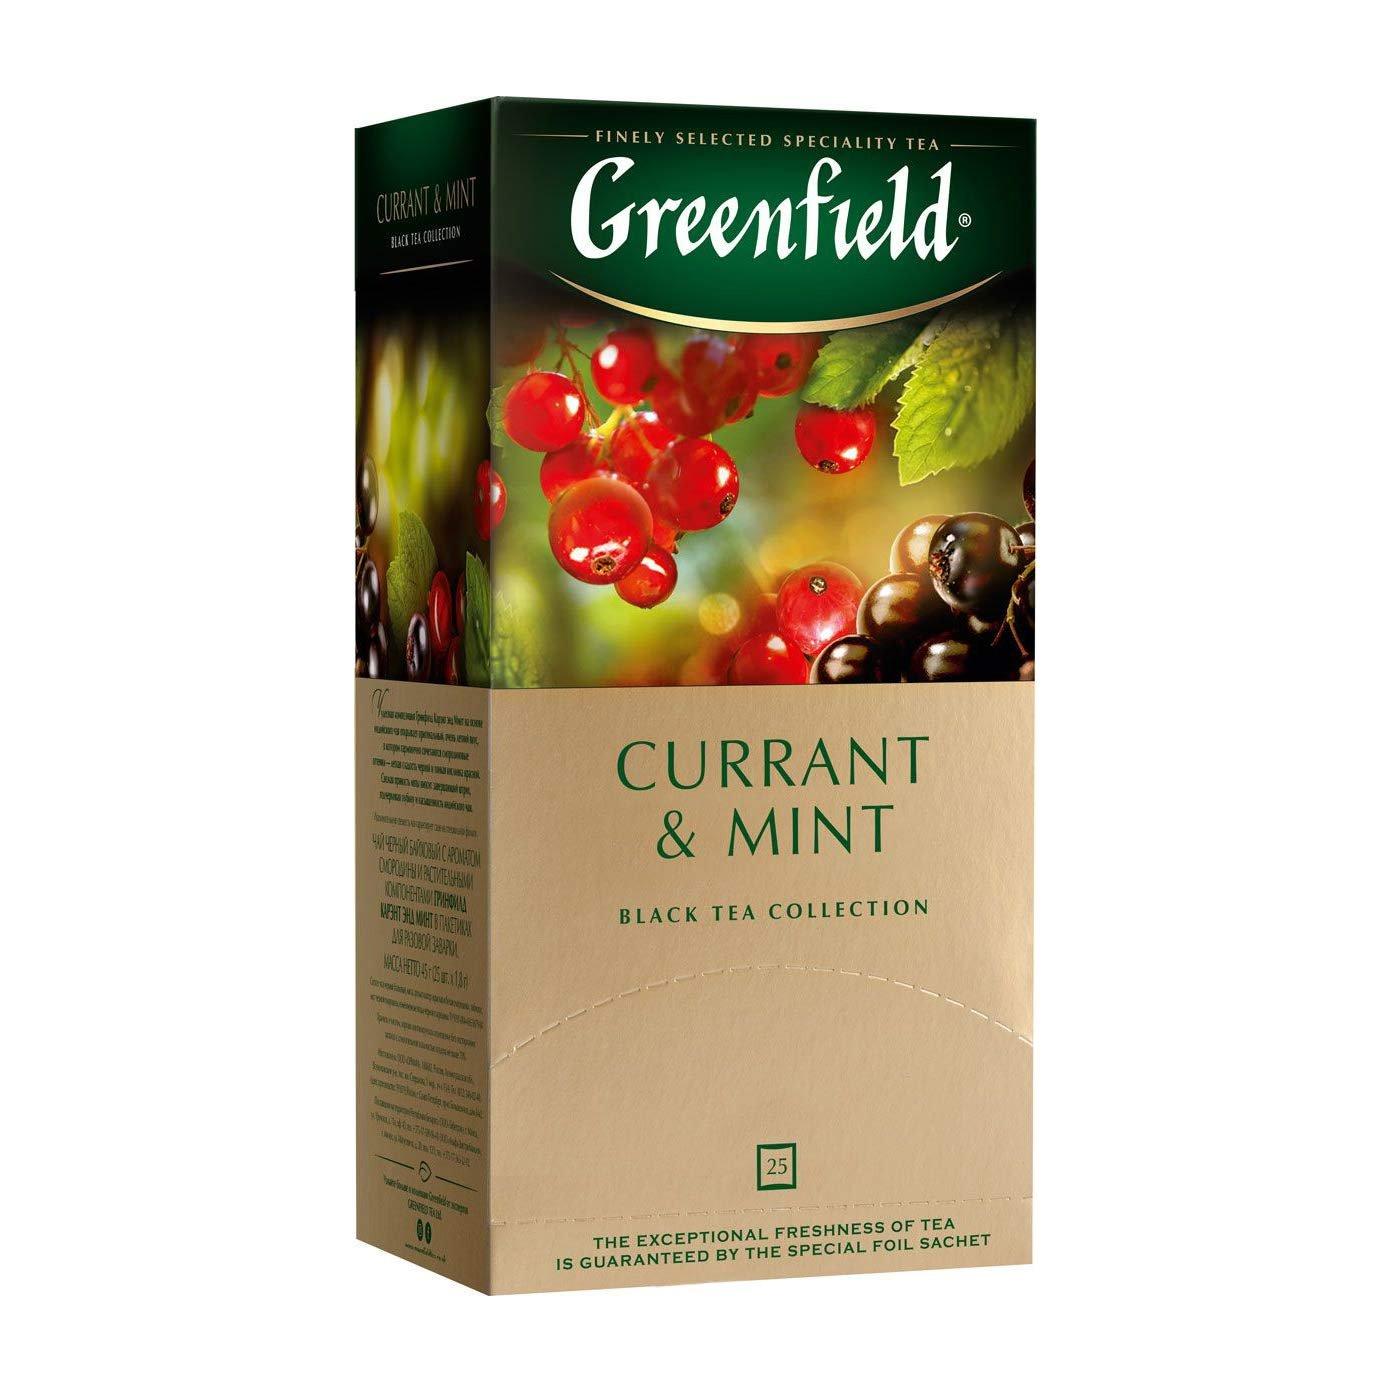 Greenfield Currant & Mint Tea 25 tea bags Russian Black Tea Collection